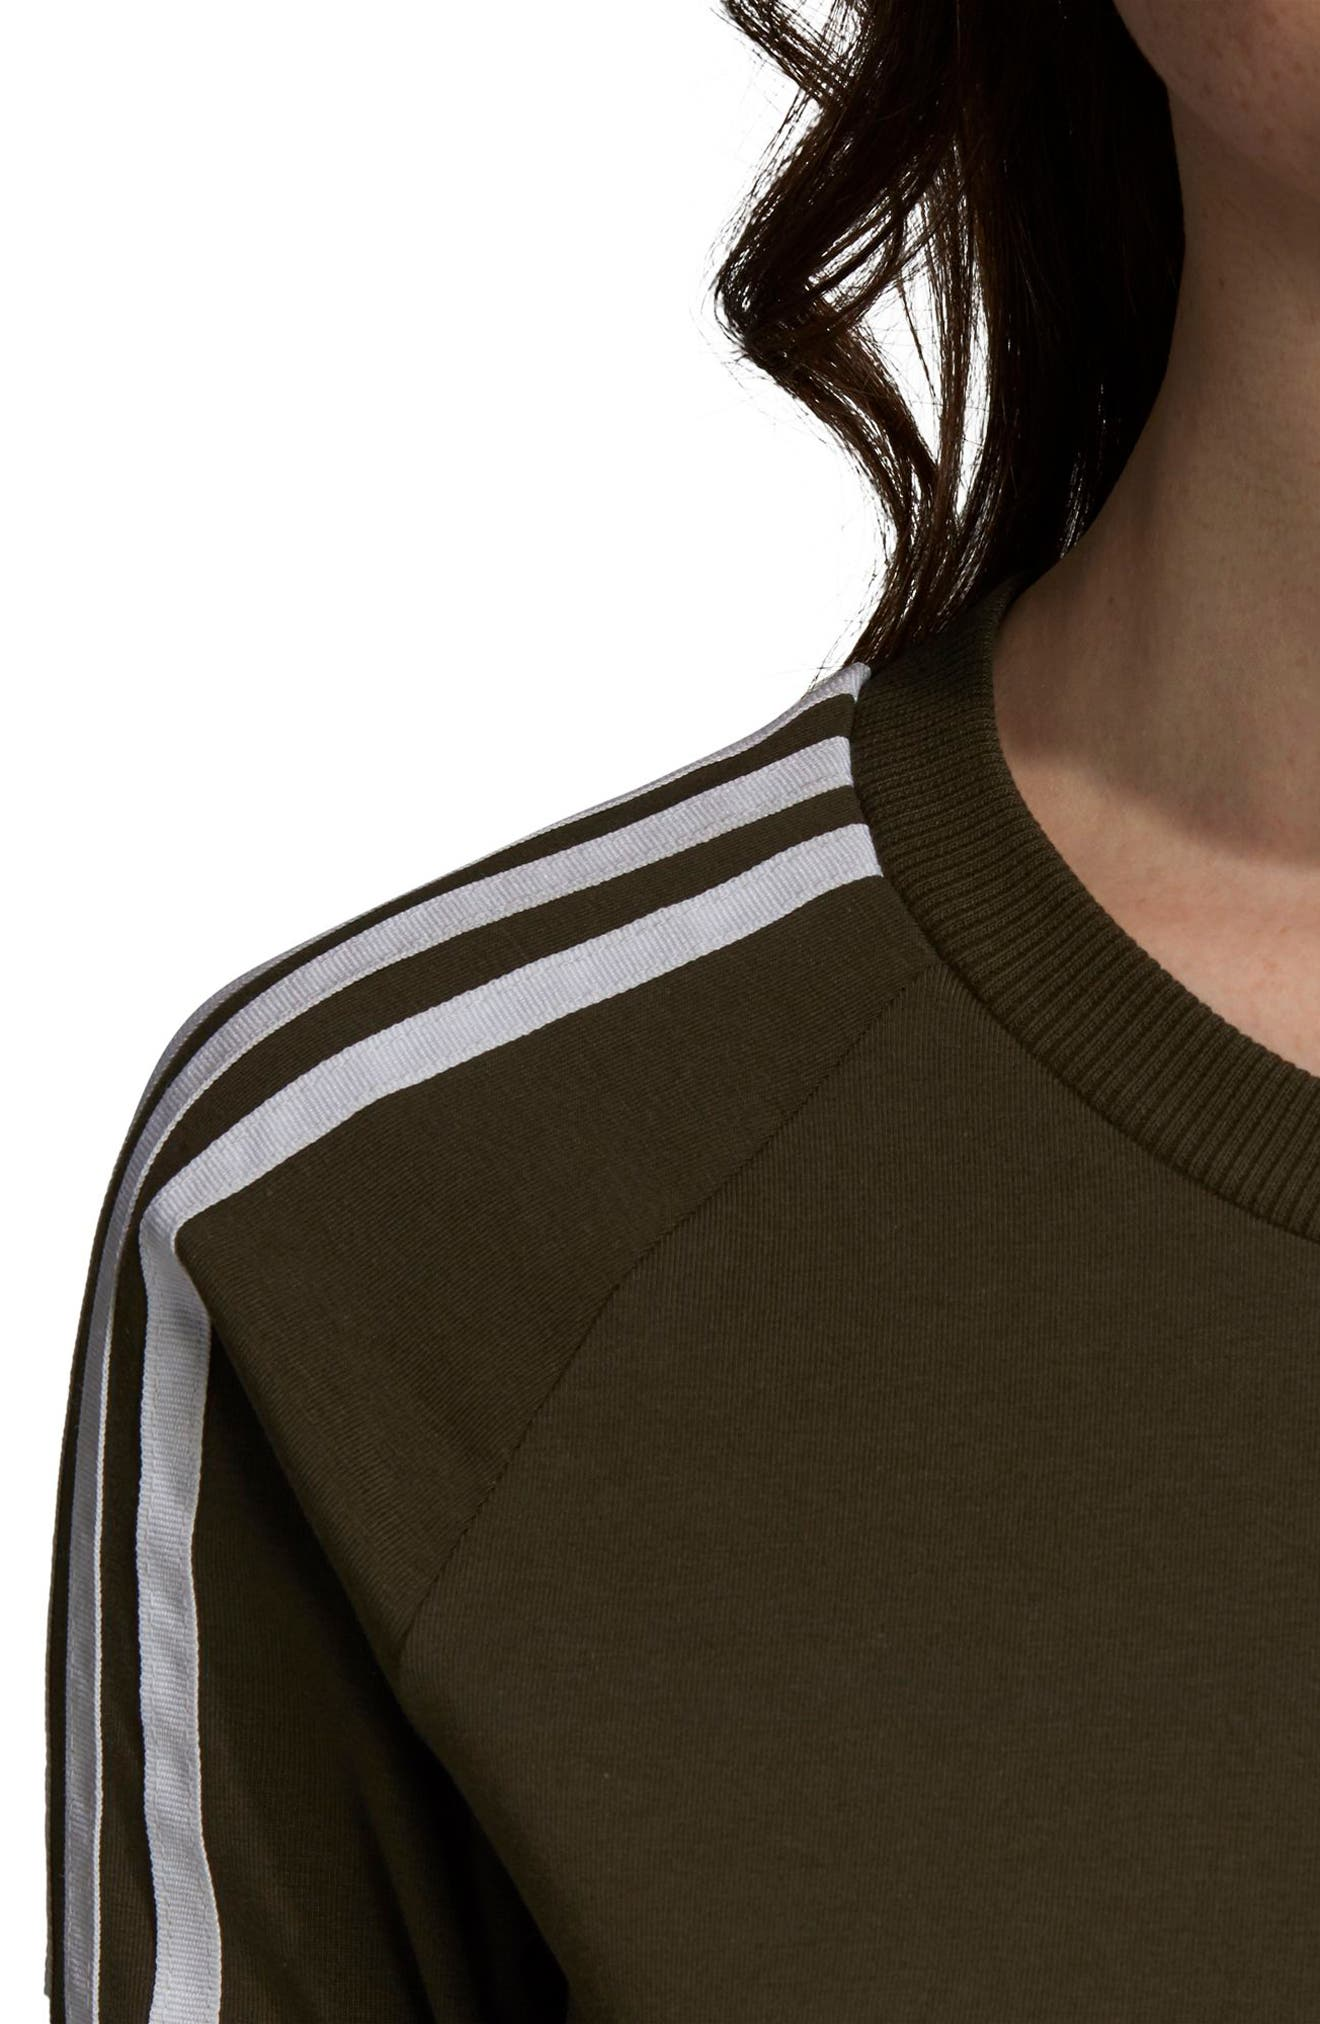 adidas 3-Stripes Dress,                             Alternate thumbnail 6, color,                             NIGHT CARGO